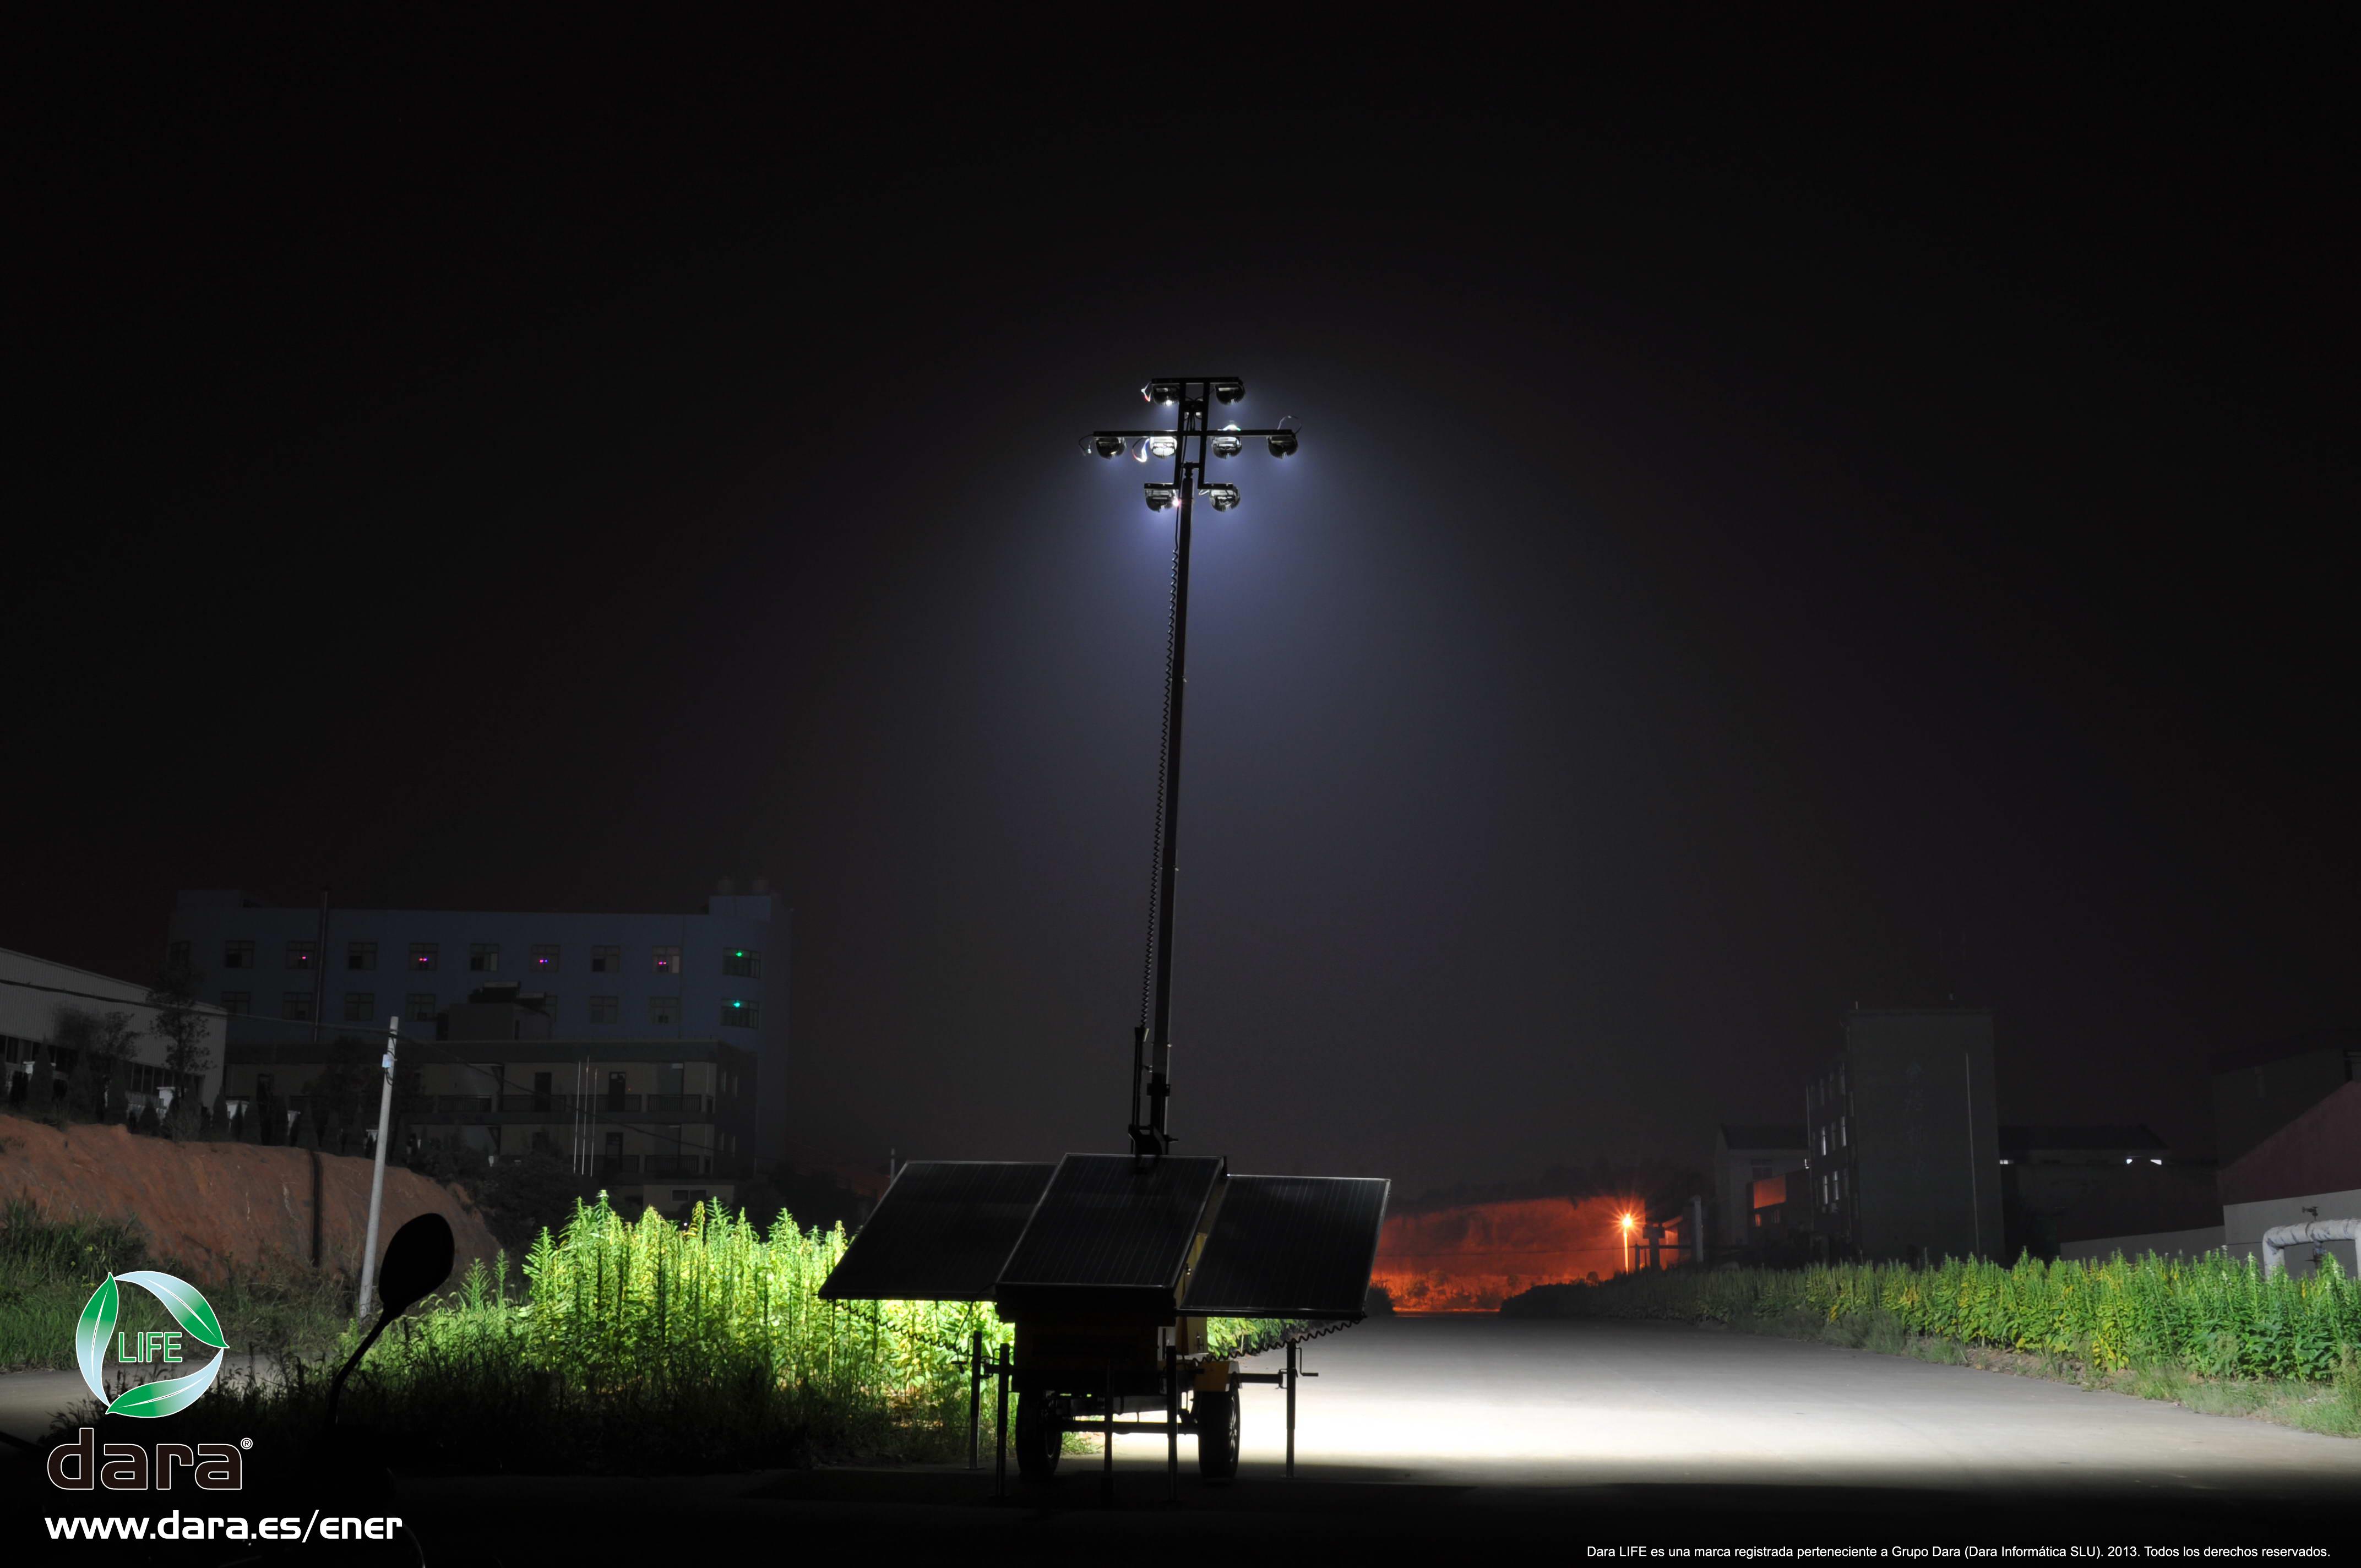 Dara life greenlight solar tower - Lamparas solares de led ...